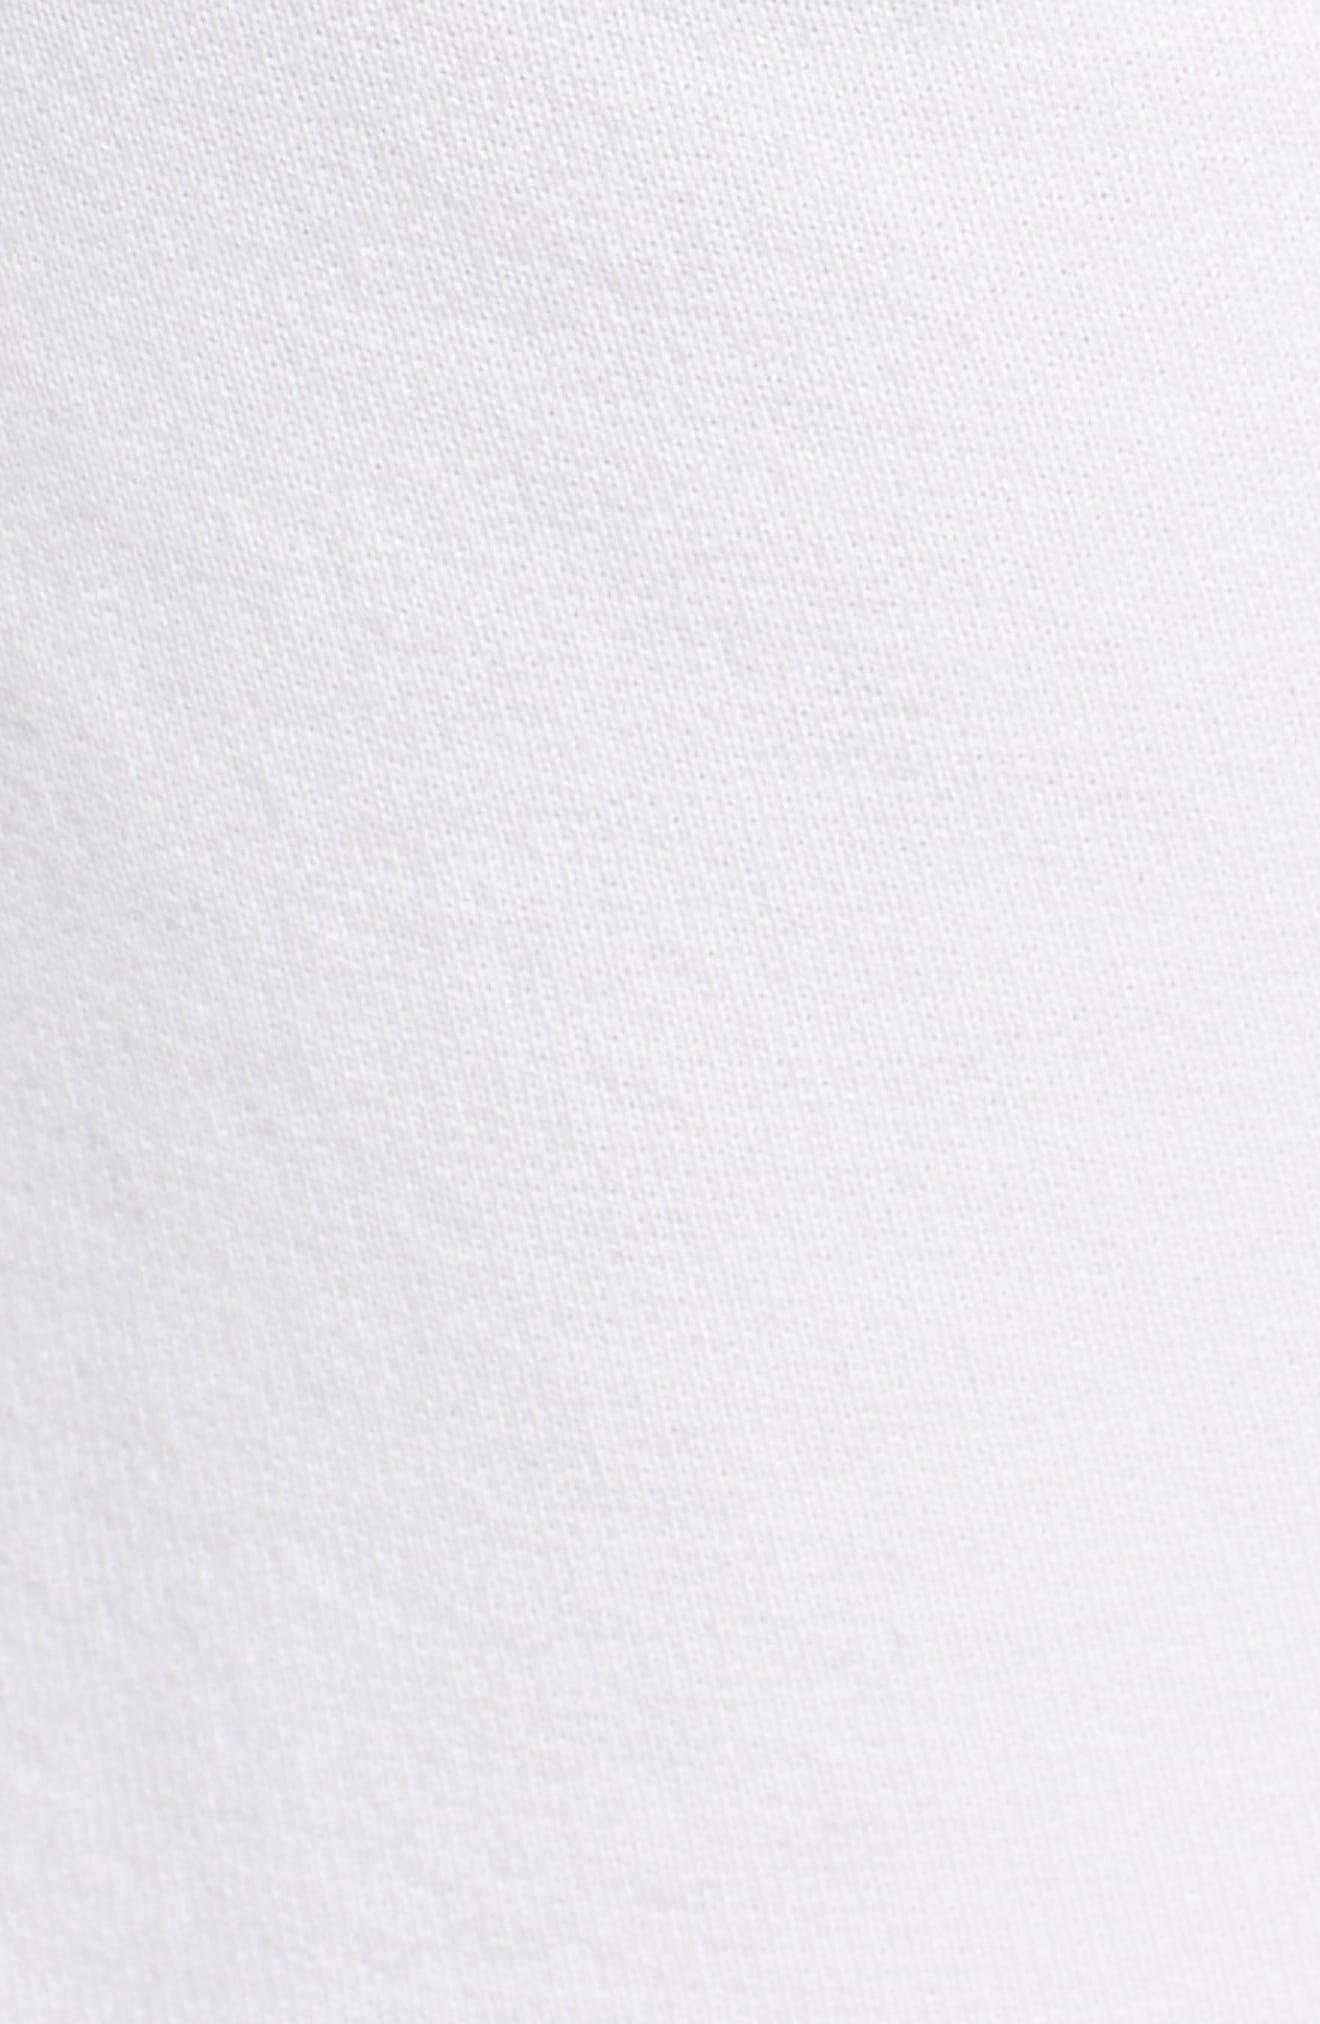 Fleece Shorts,                             Alternate thumbnail 5, color,                             Dirty White 10 Yr Vintage